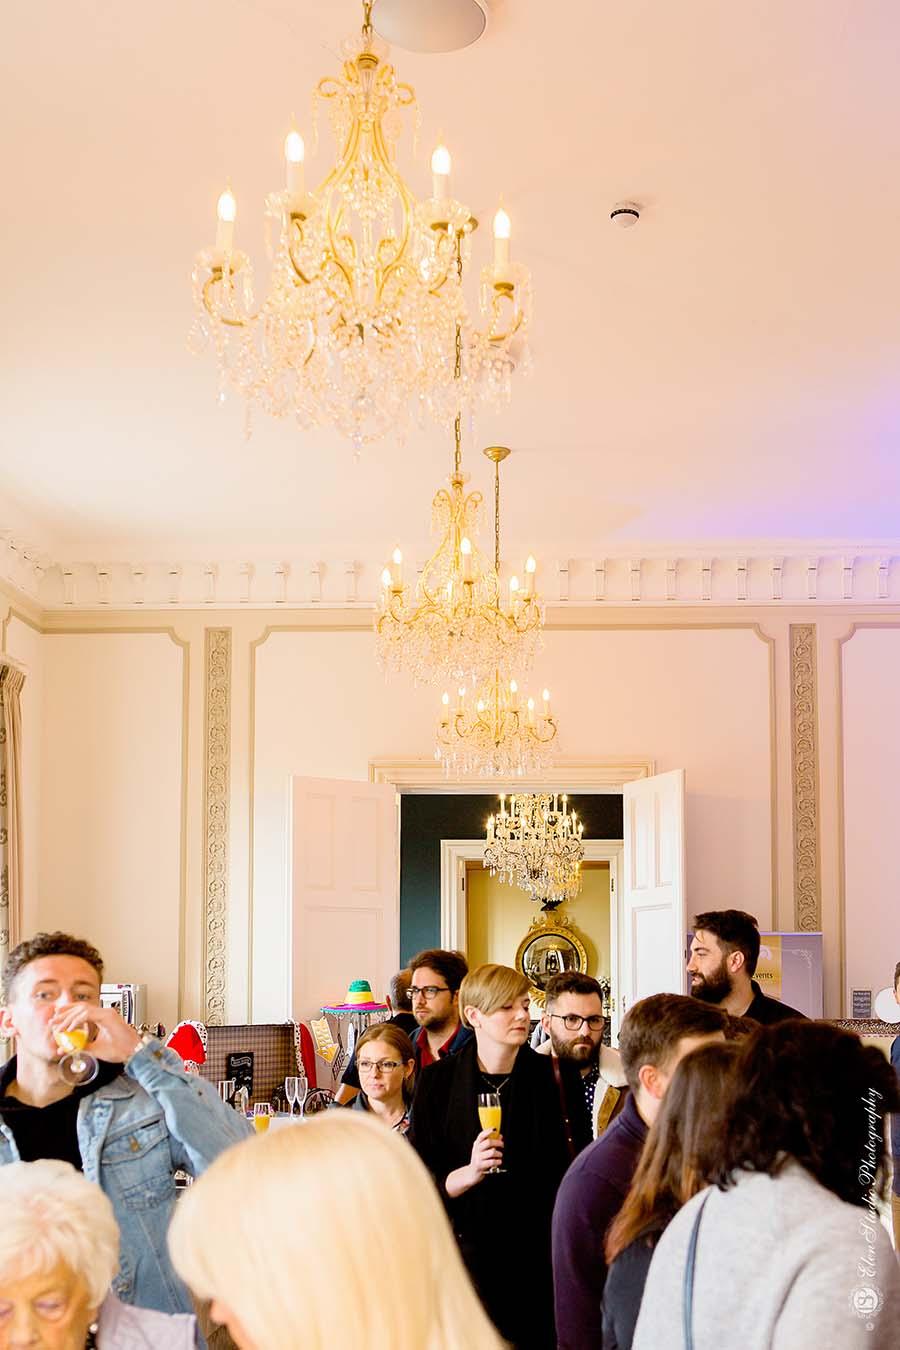 Hodsock-priory-wedding-fair-Elen-Studio-Photography-038